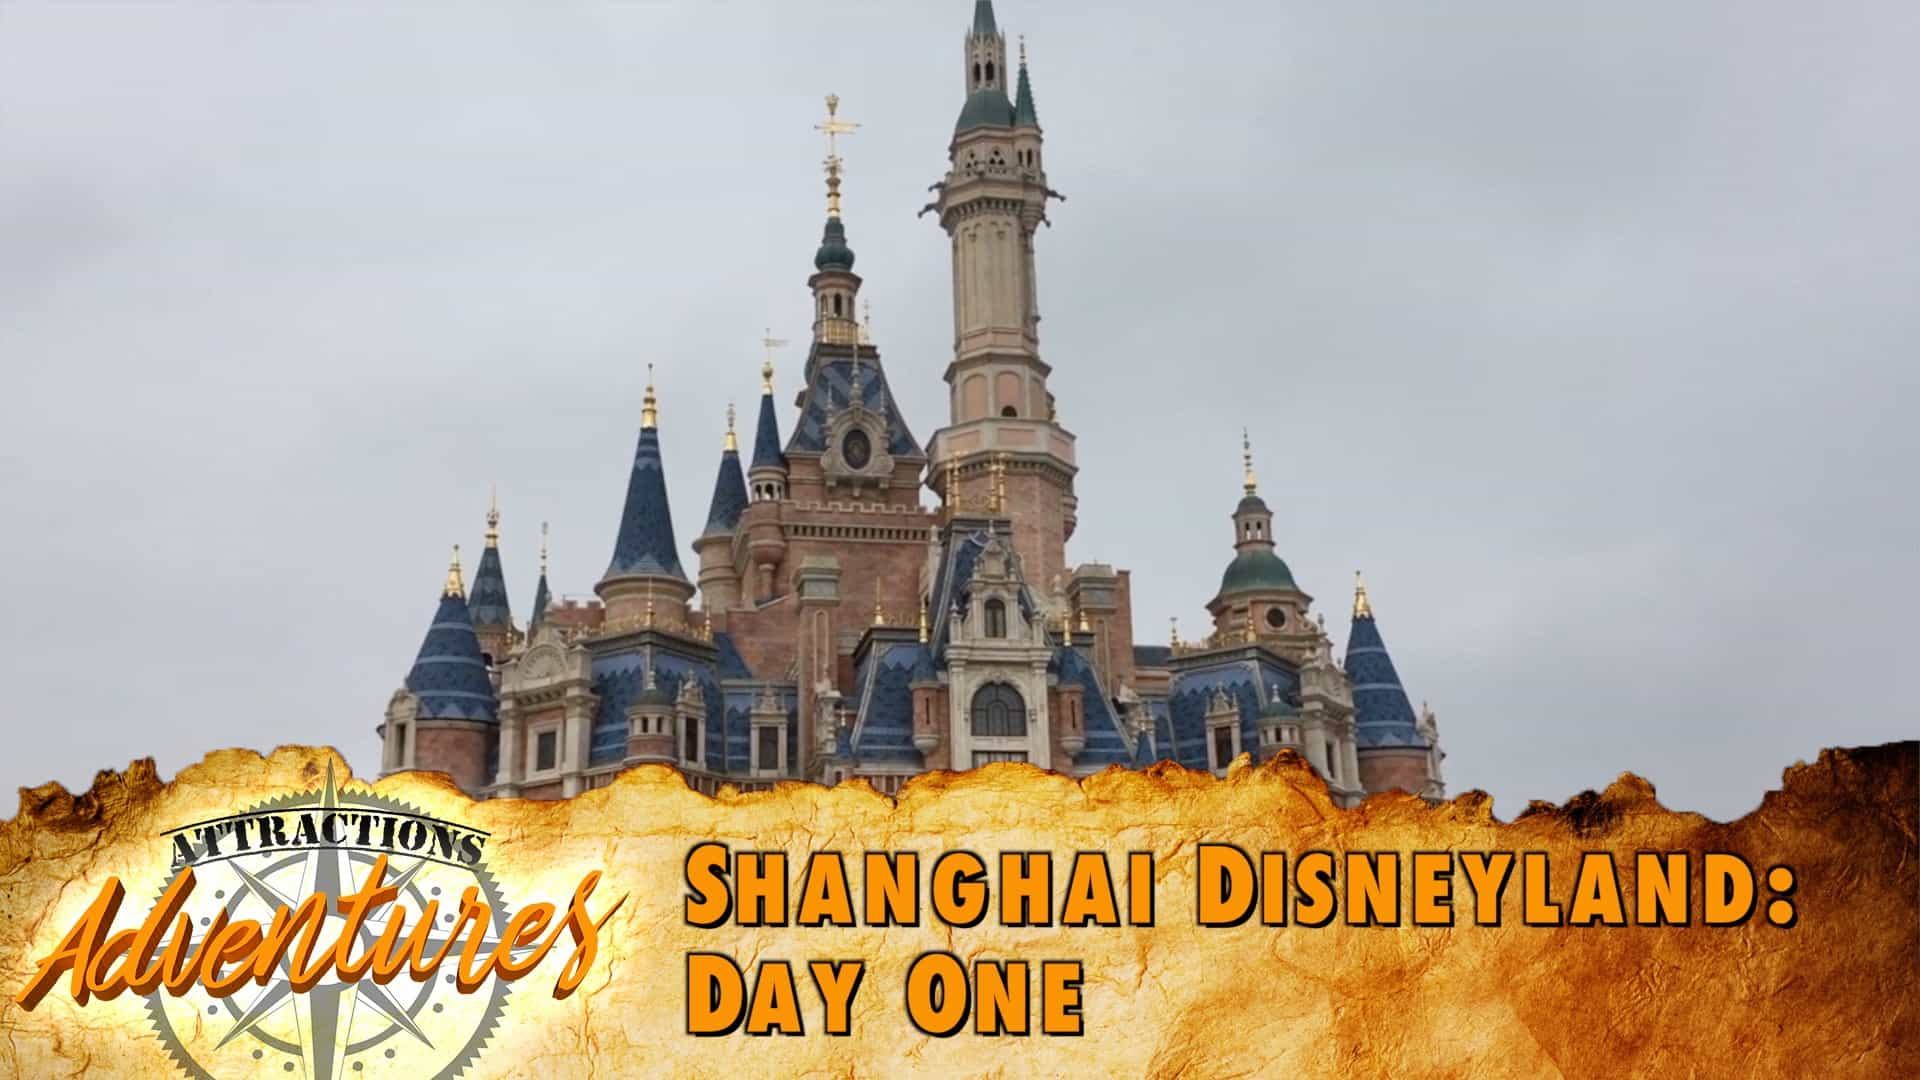 Attractions Adventures Shanghai Disneyland Day One